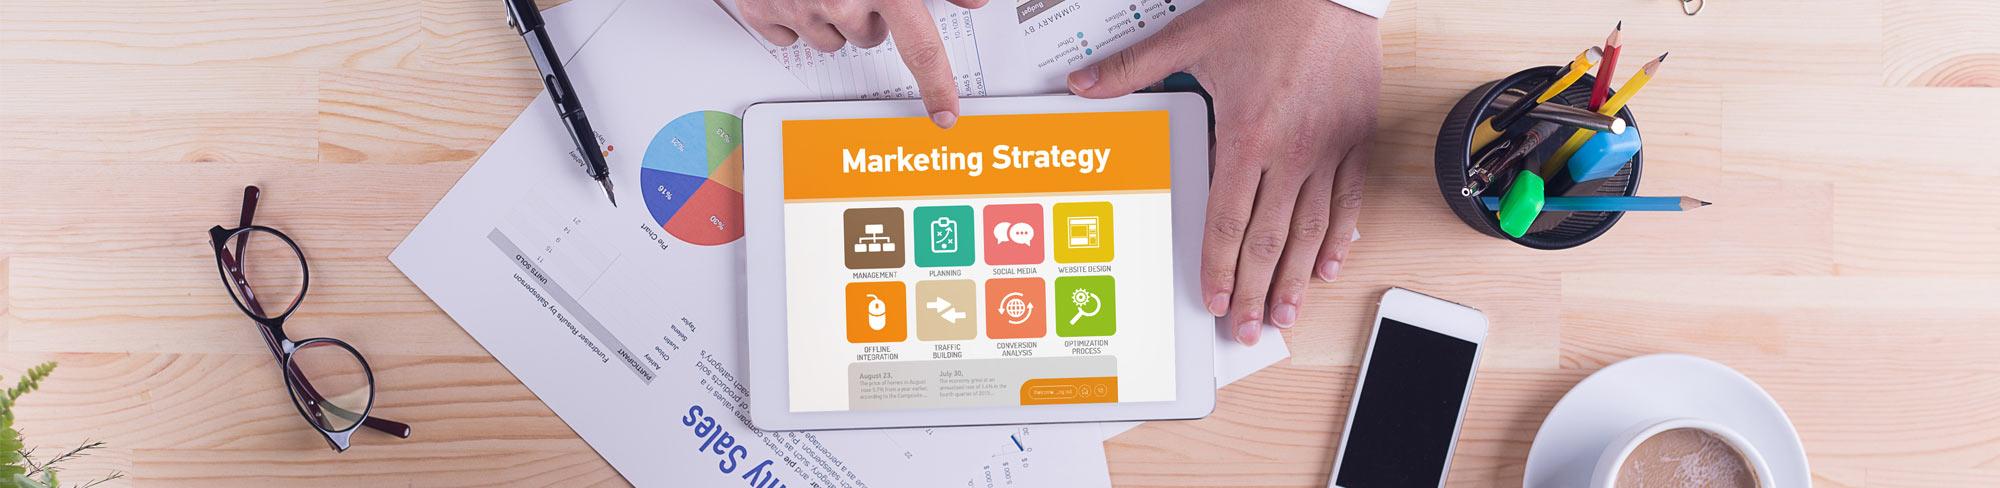 Inbound Marketing for Manufacturers - Lead Generation